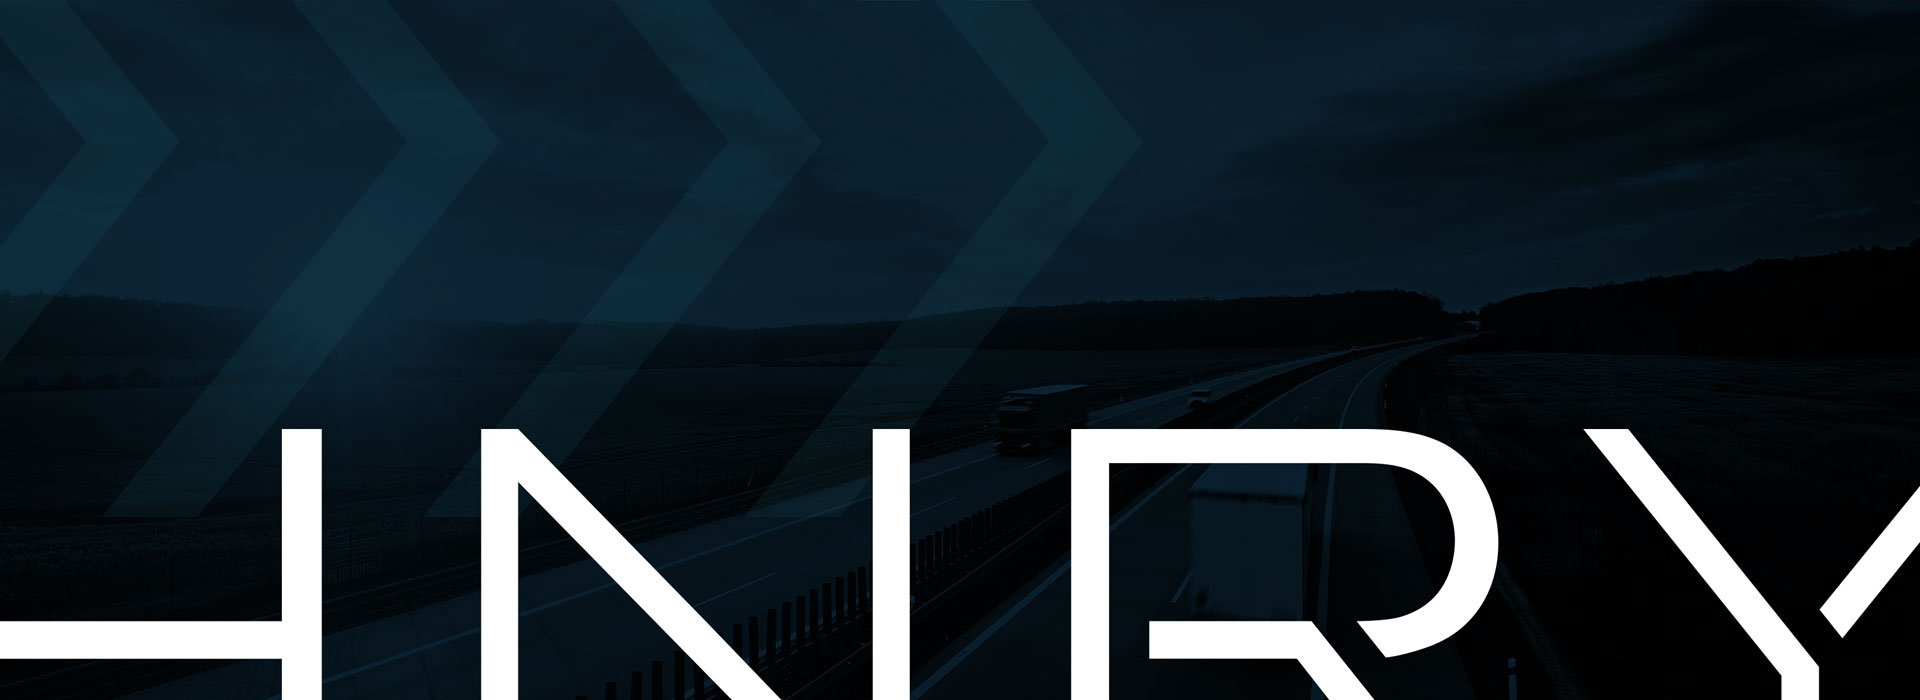 HNRY - Branding, Identity Design, Logos